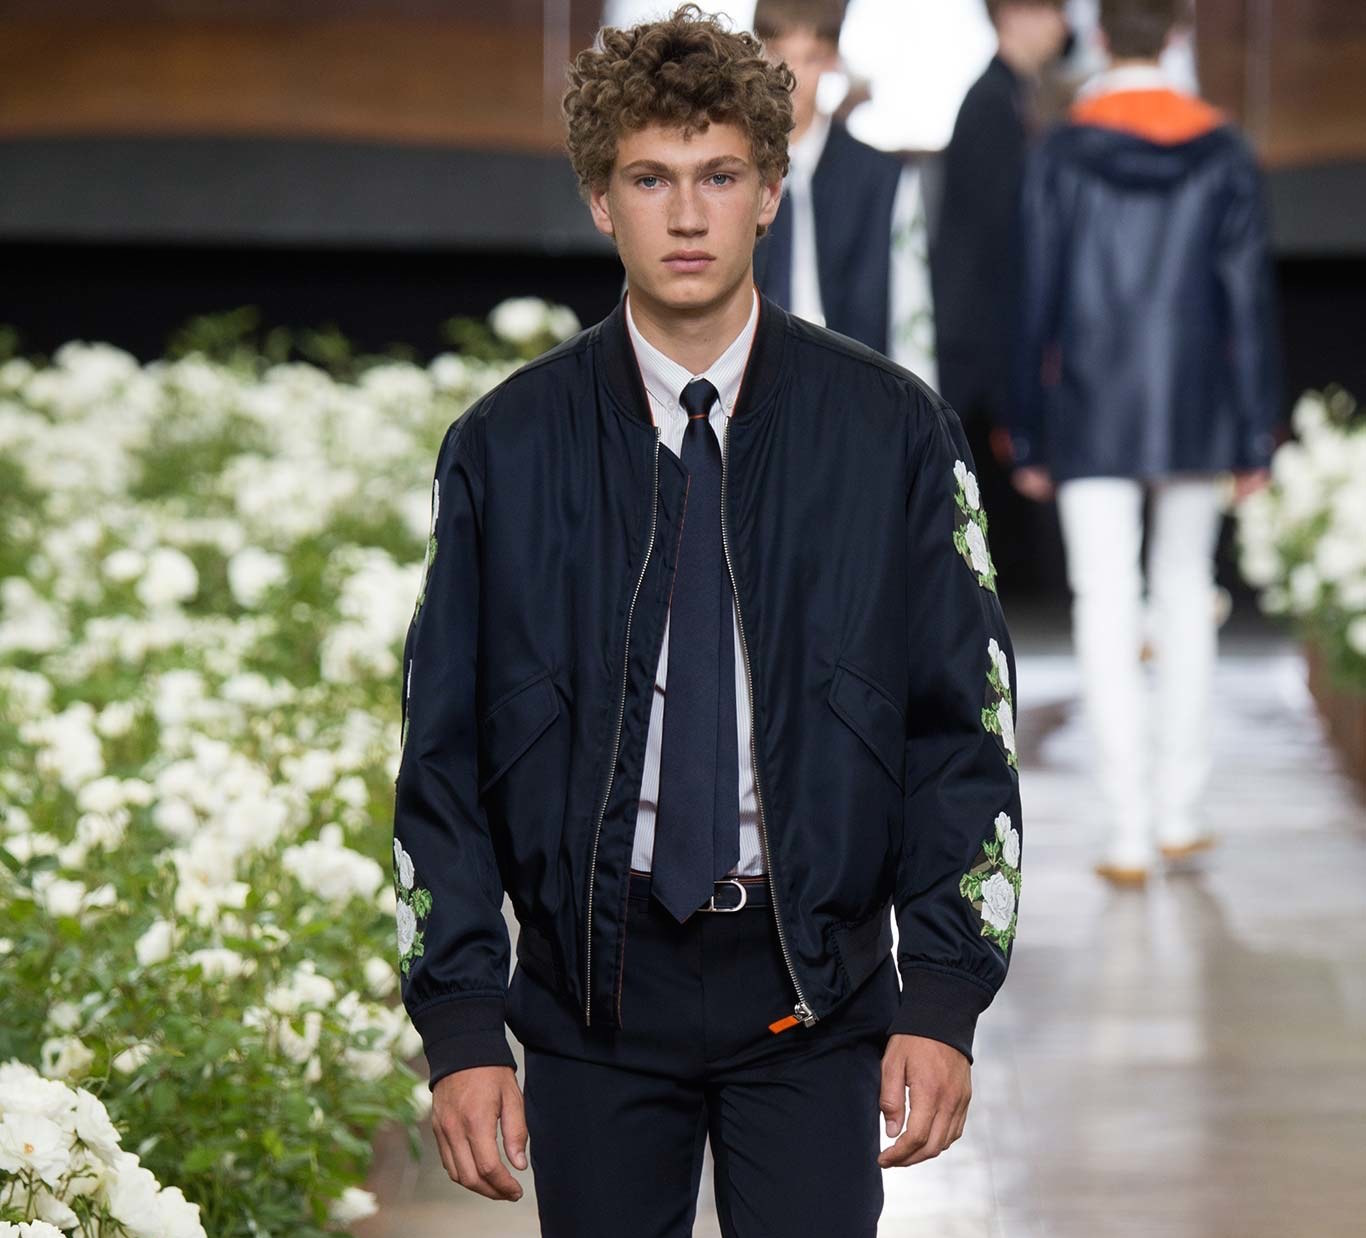 dior-homme-ss-2016-floral-jacket